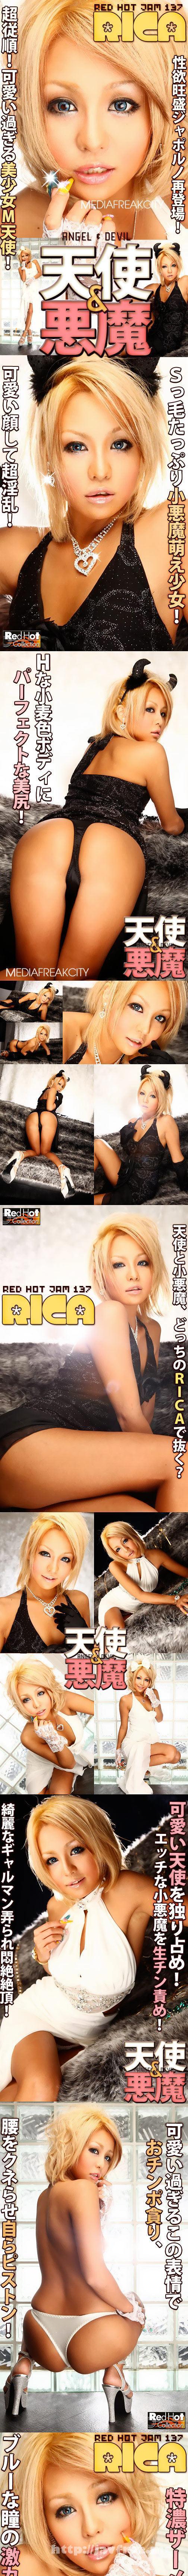 [RHJ 137] レッドホットジャム Vol.137 天使と悪魔 my both side : RICA RICA RHJ